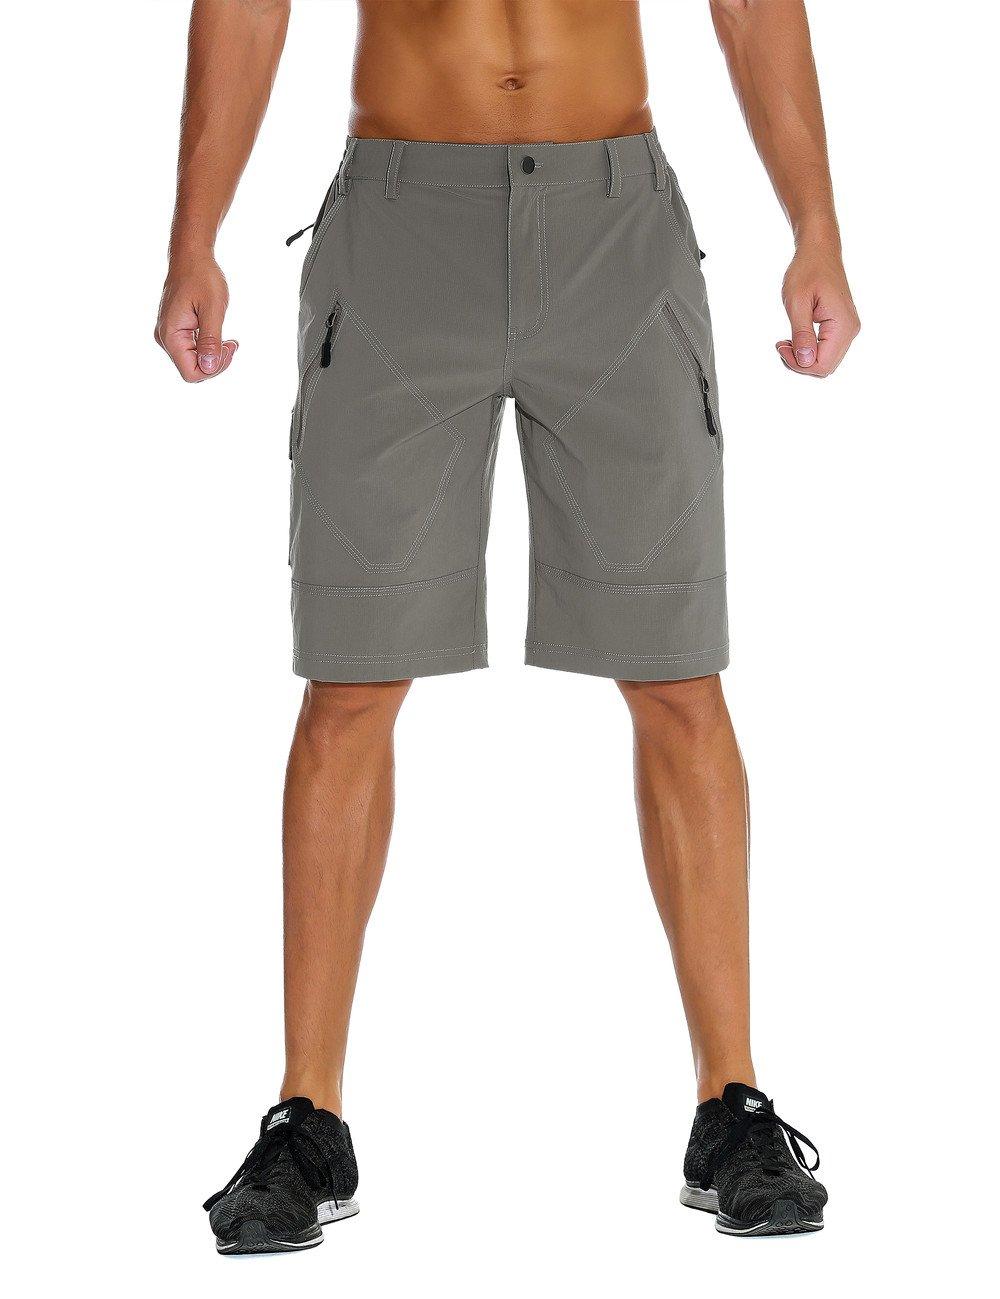 Unitop Men's Lightweight Quick Dry Hiking Cargo Shorts Light Gray 38